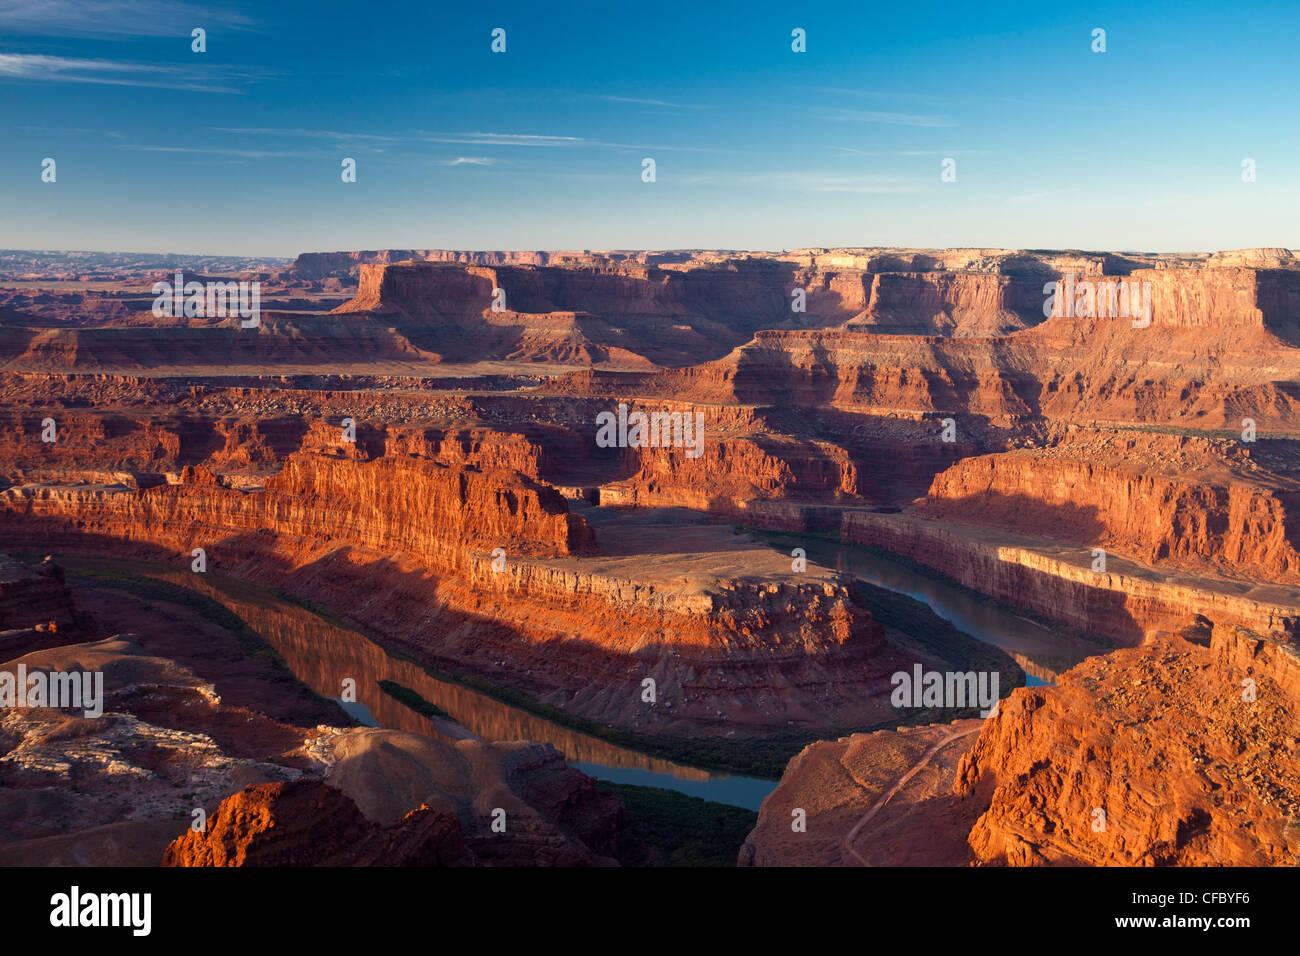 USA, United States, America, Utah, Canyonlands Park, Dead Horse, Point, Colorado river, adventure, big, deep, dry, - Stock Image